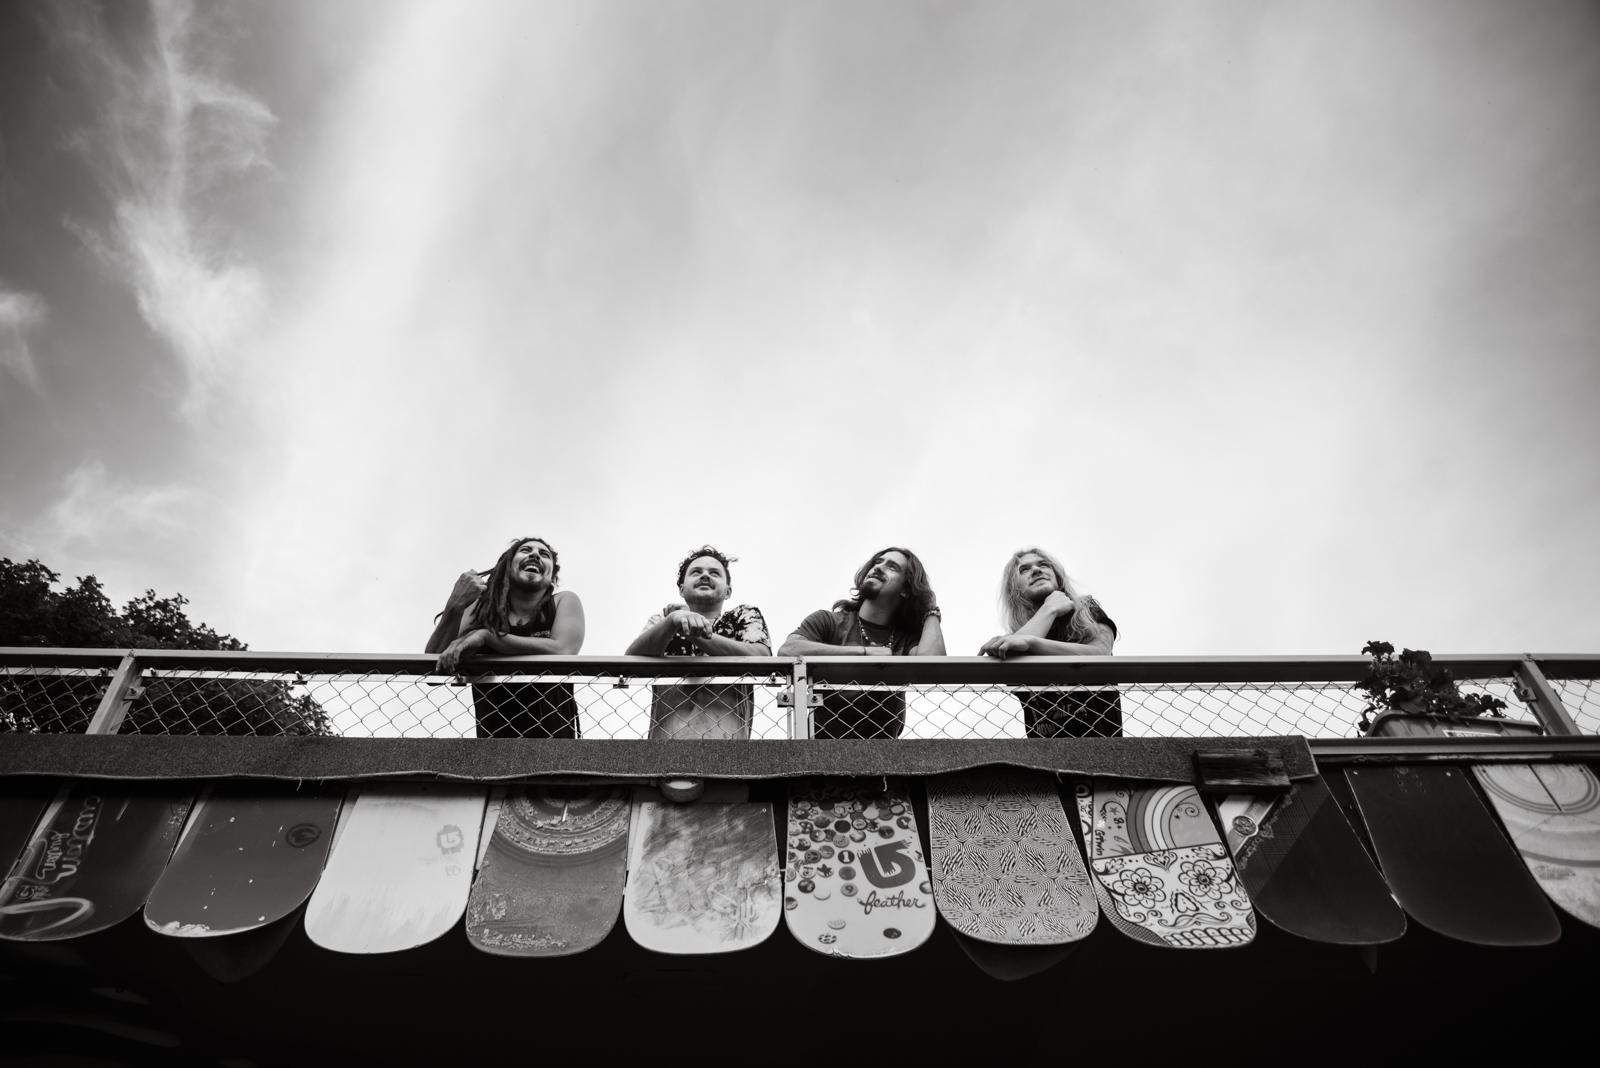 08102017-GangofThieves-JuliaLuckettPhotography-68.jpg